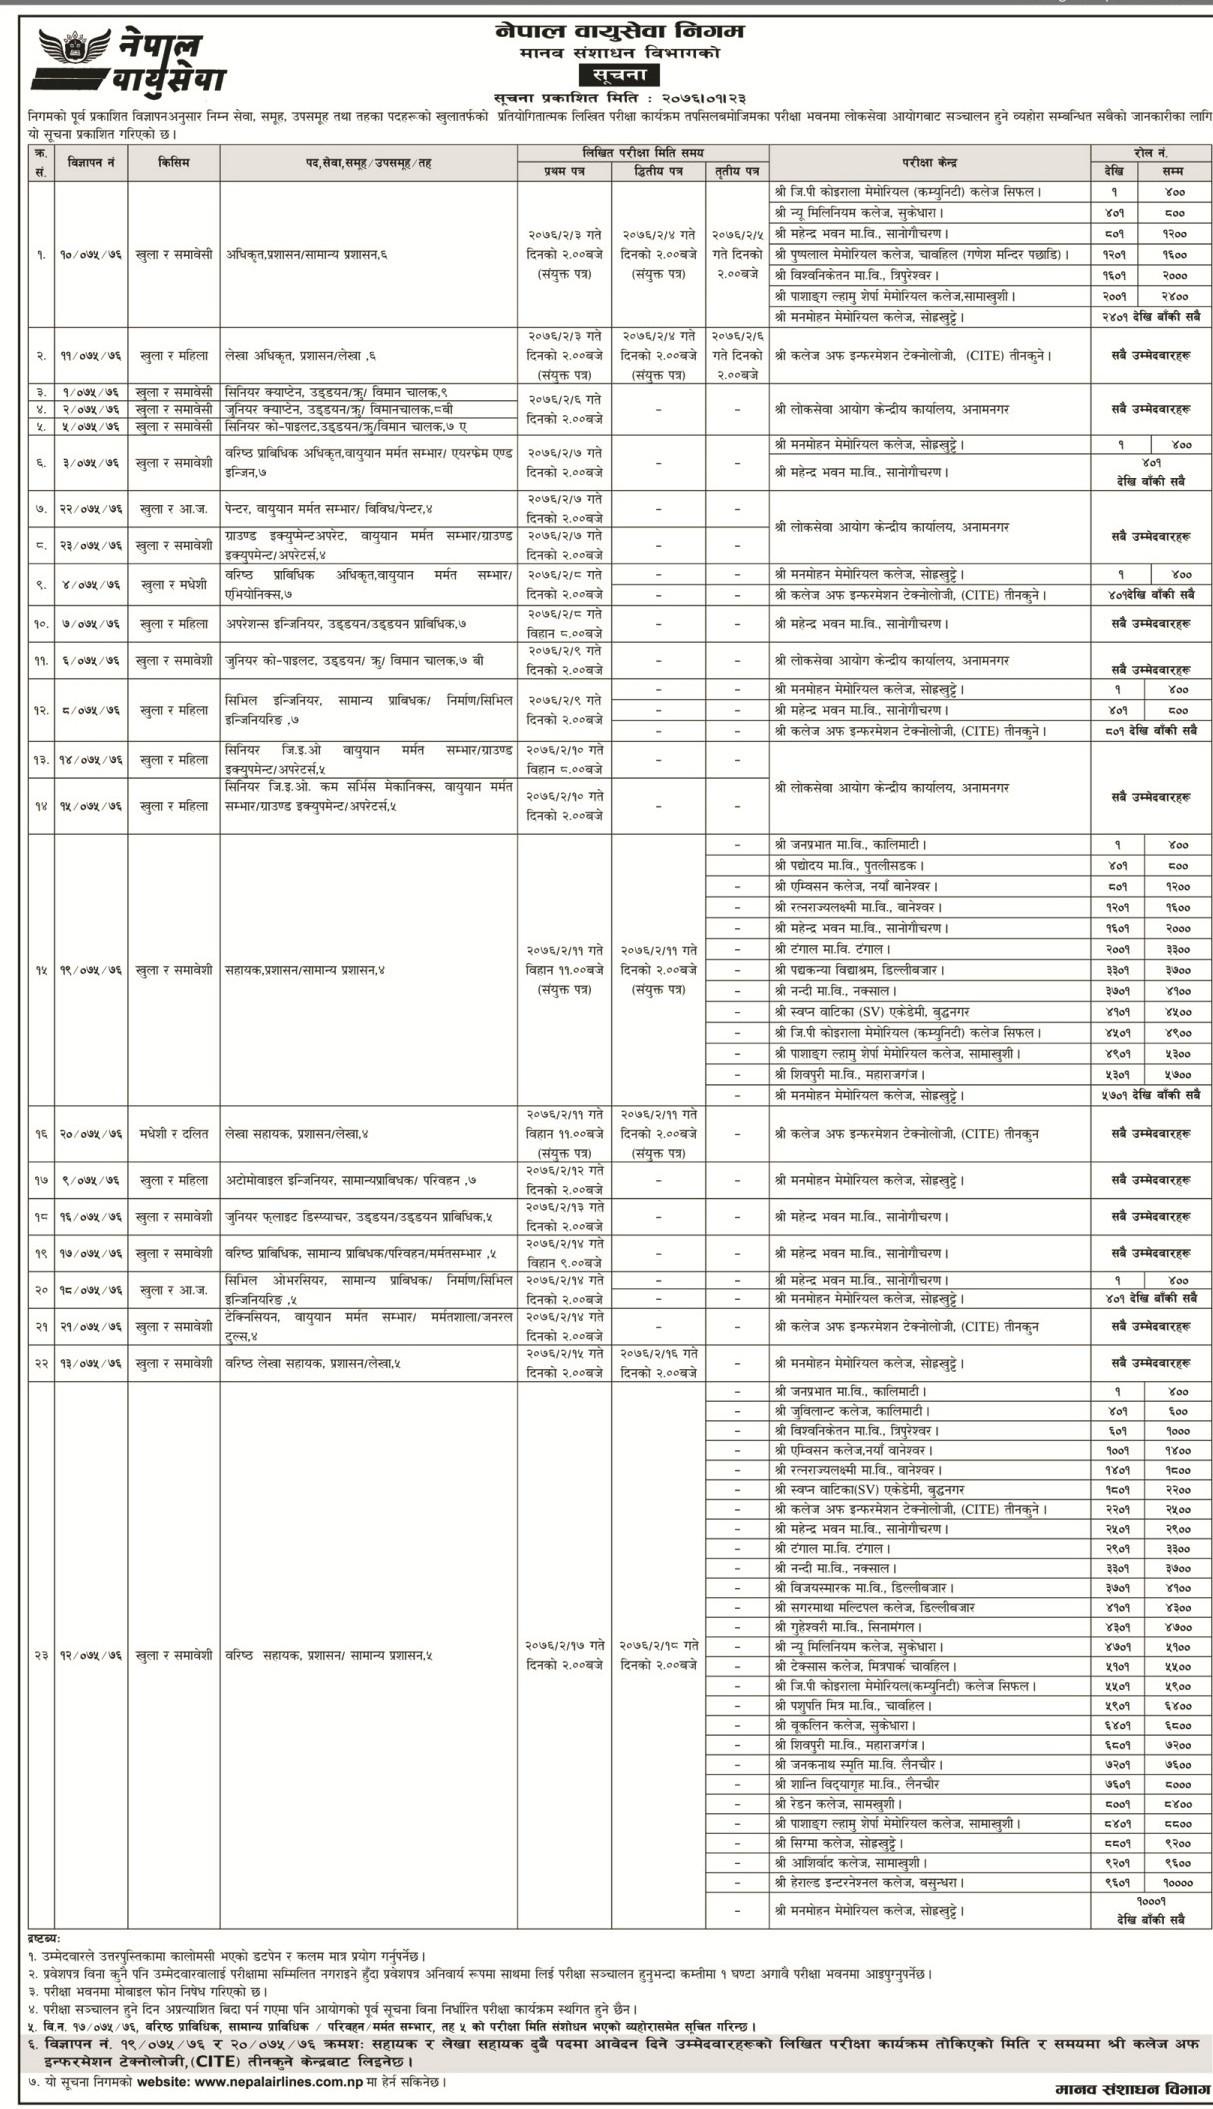 Written Exam Notice for Nepal Airlines Corporation| Job vacancy Nepal